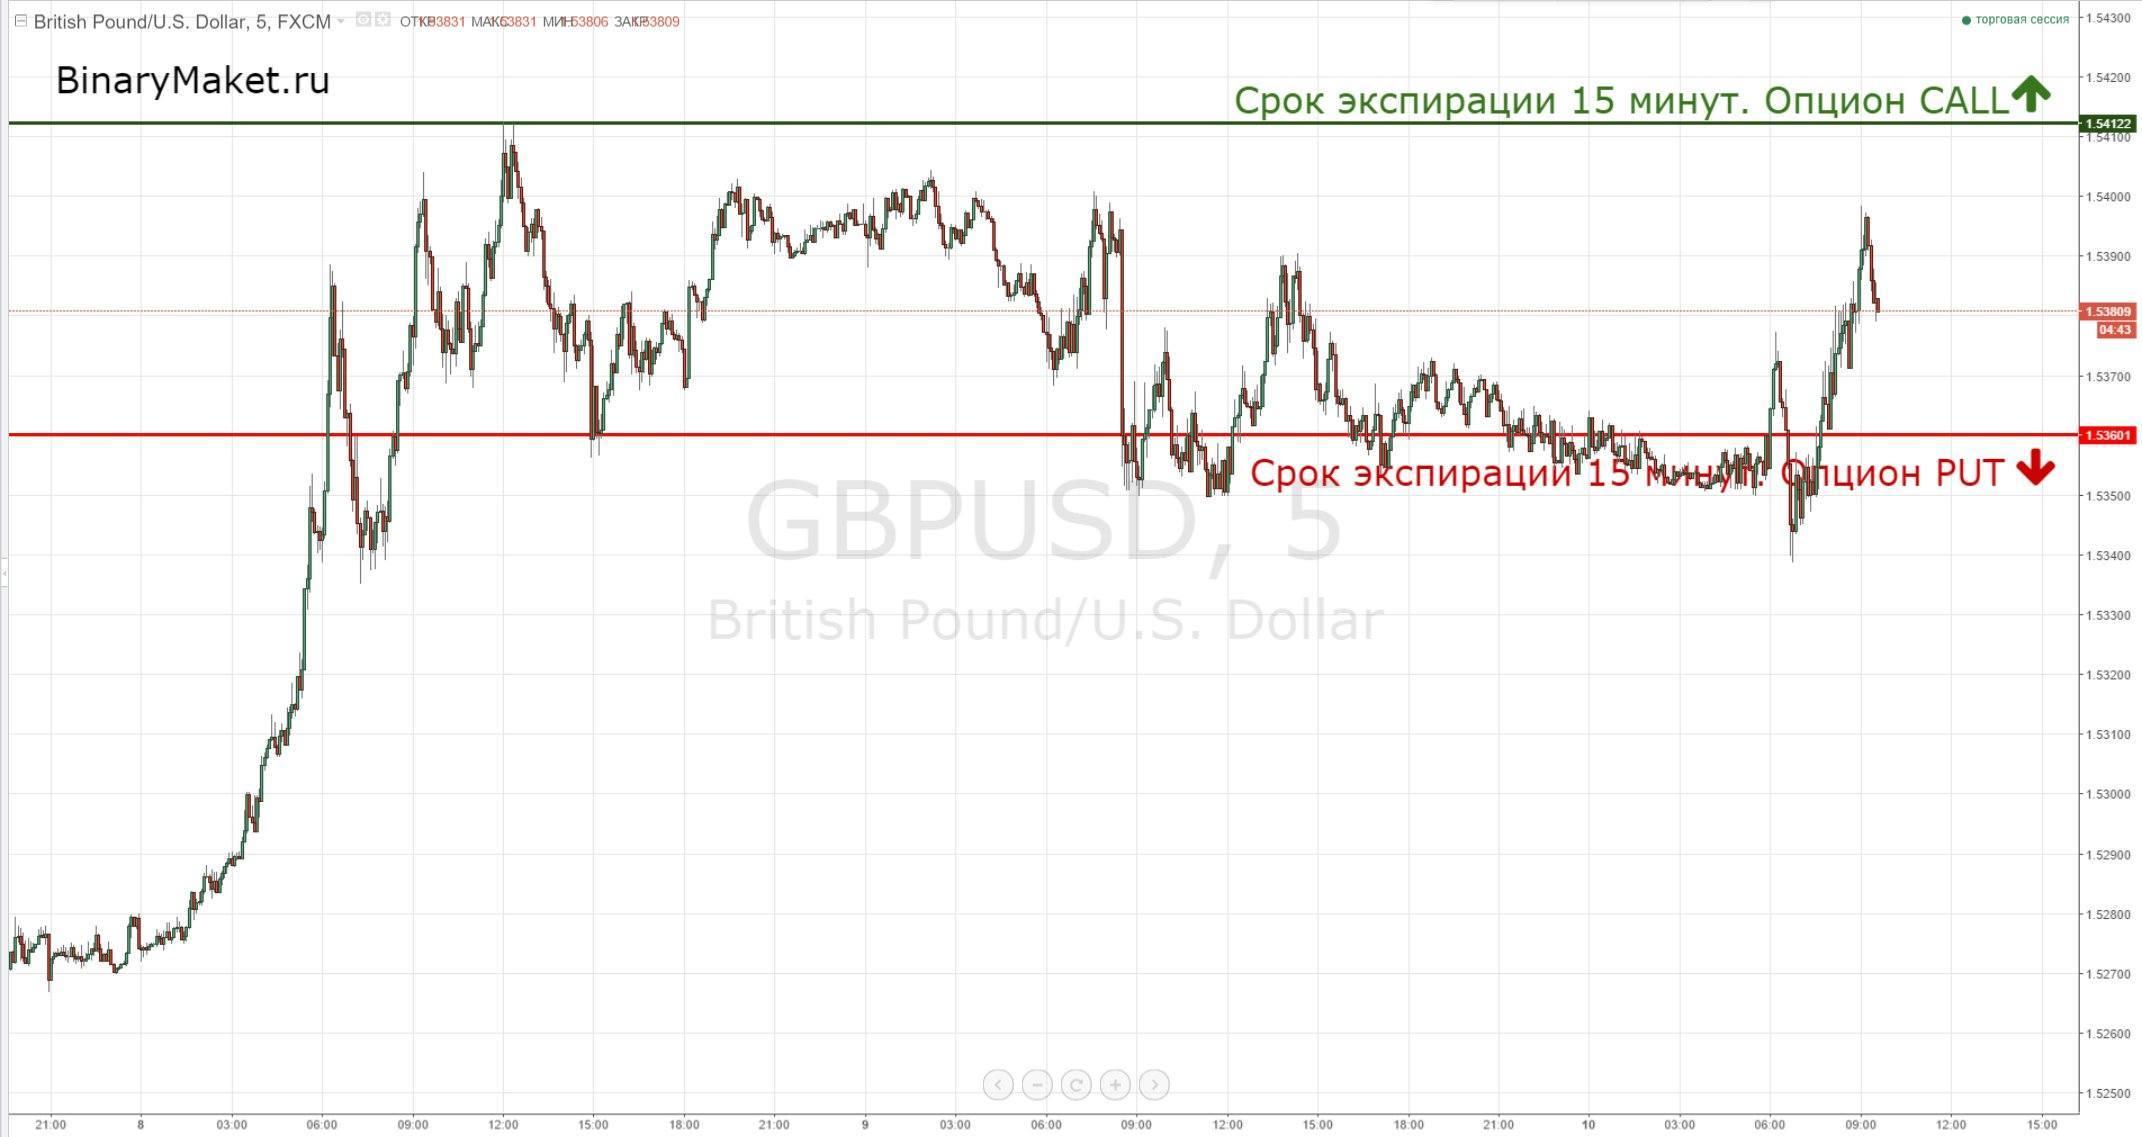 GBPUSD сигналы 10-09